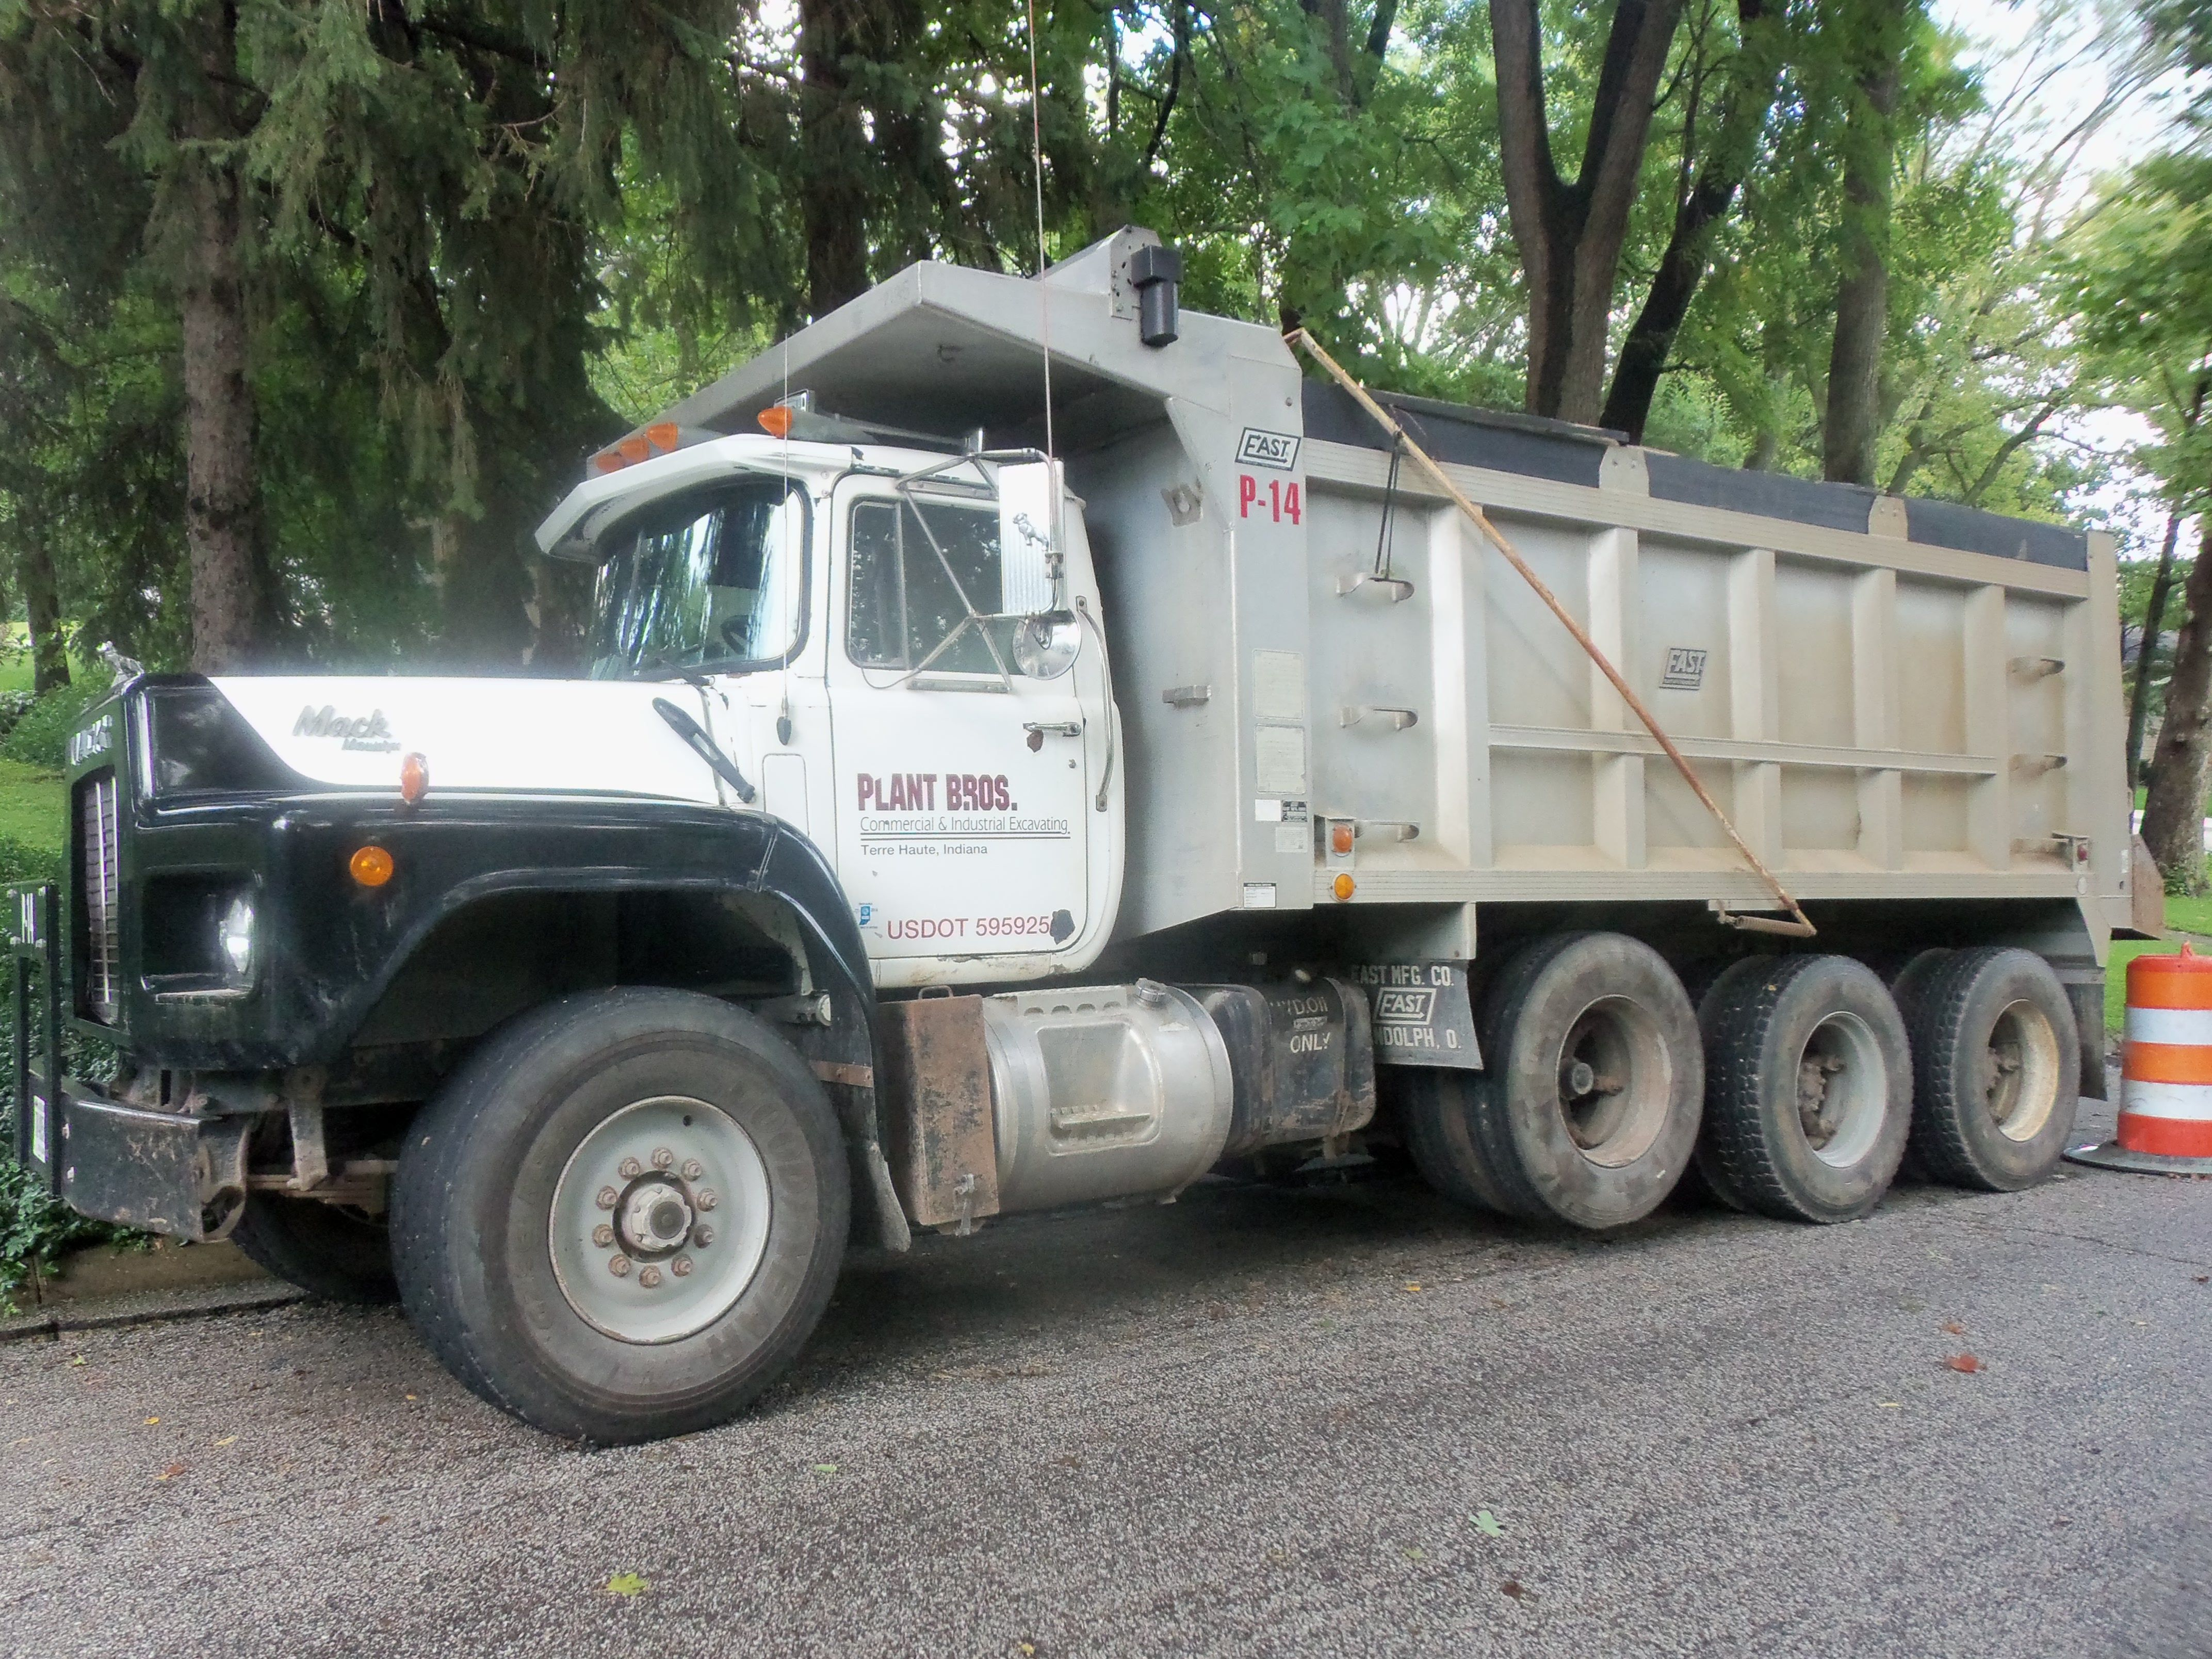 Tri Axle Garbage Truck : Mack tri axle dump truck on sunset st my